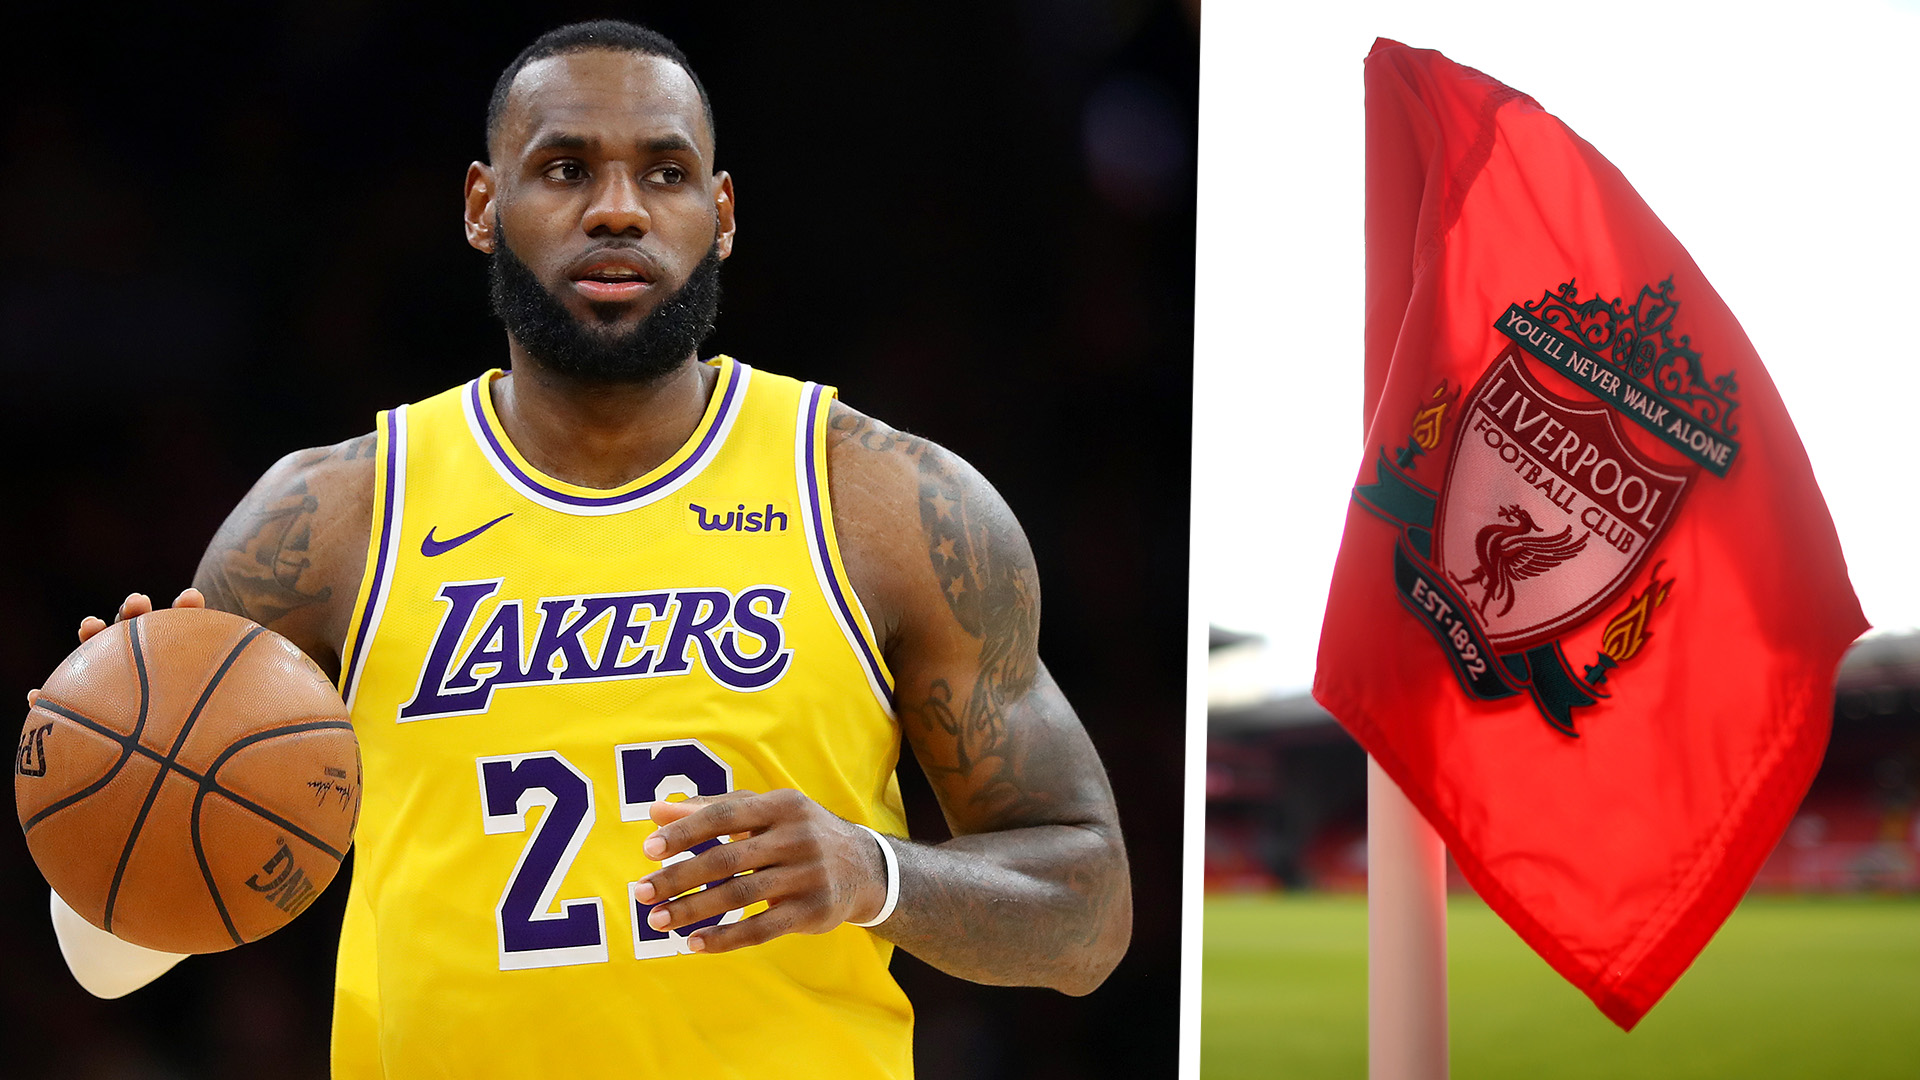 LeBron James and Liverpool: LA Lakers star Premier League investment explained